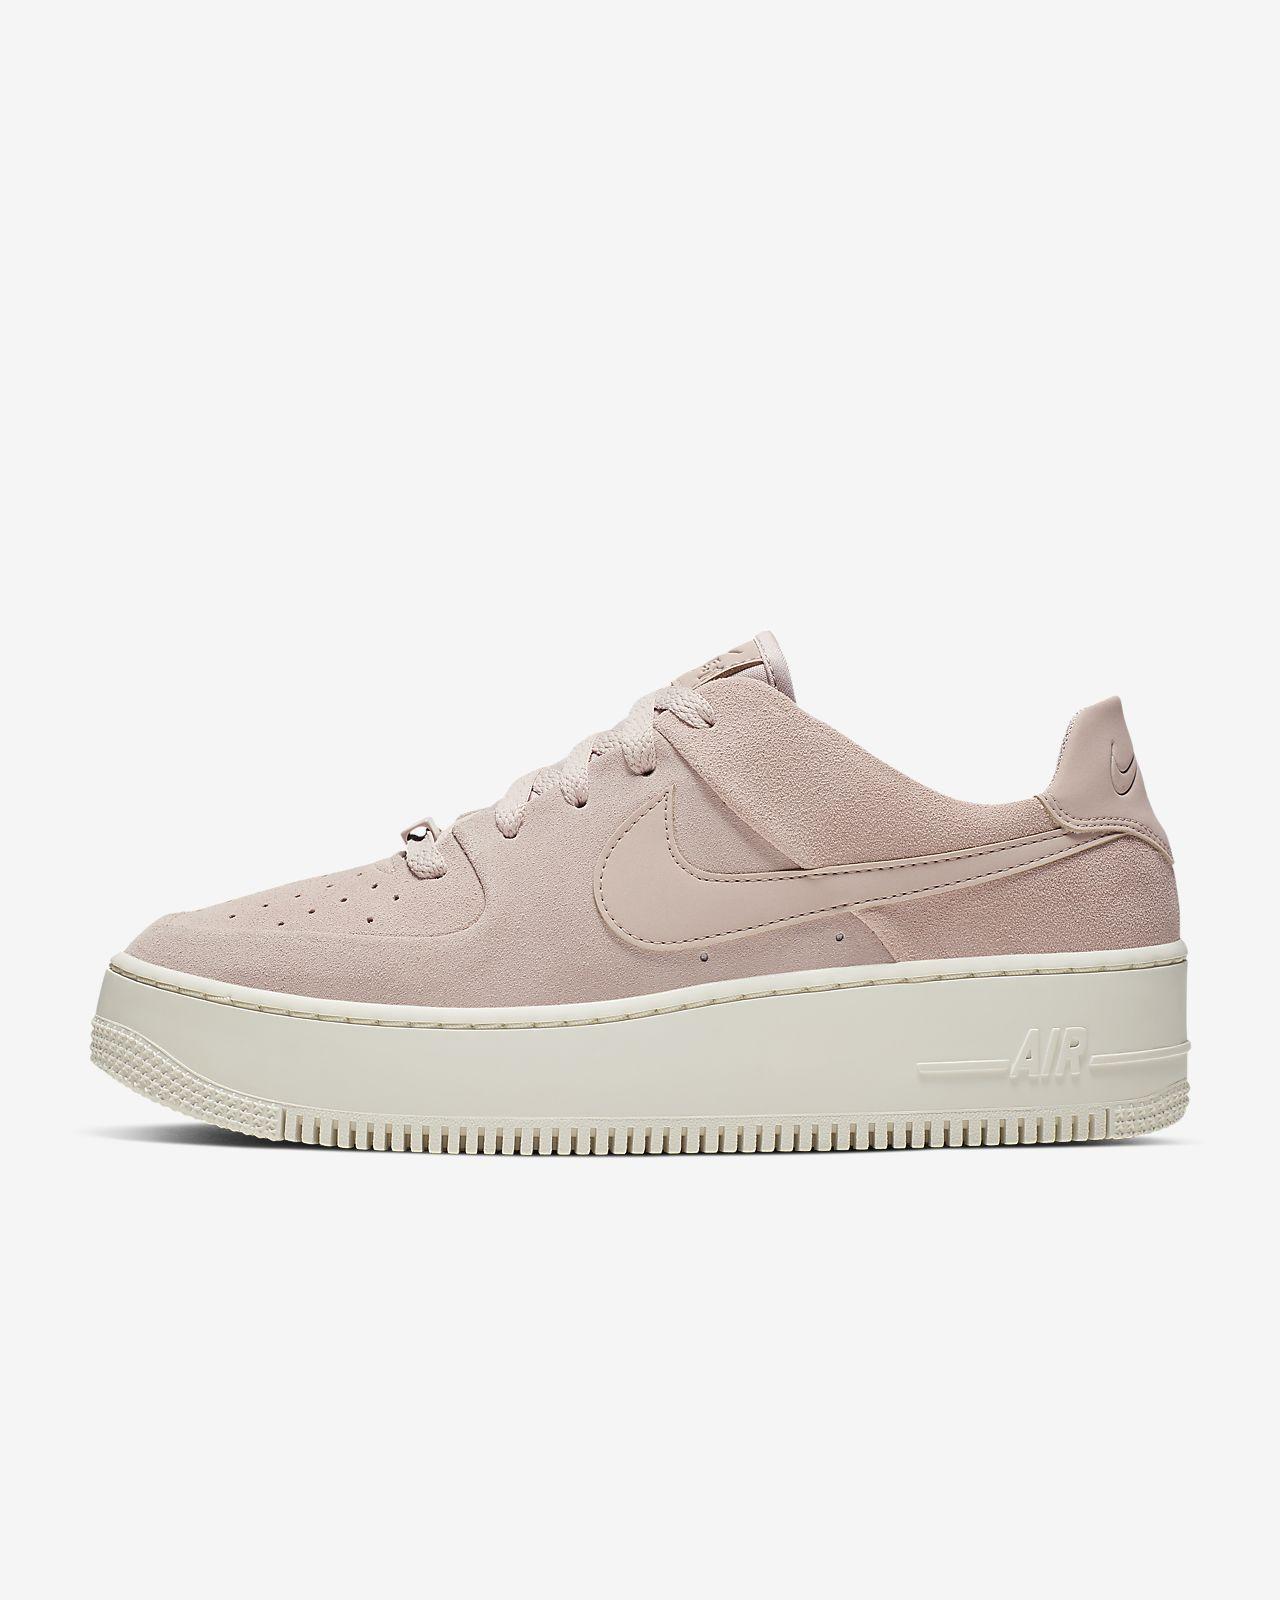 buy popular 13325 af85d ... real nike air force 1 sage low damenschuh 5ddb8 21fa6